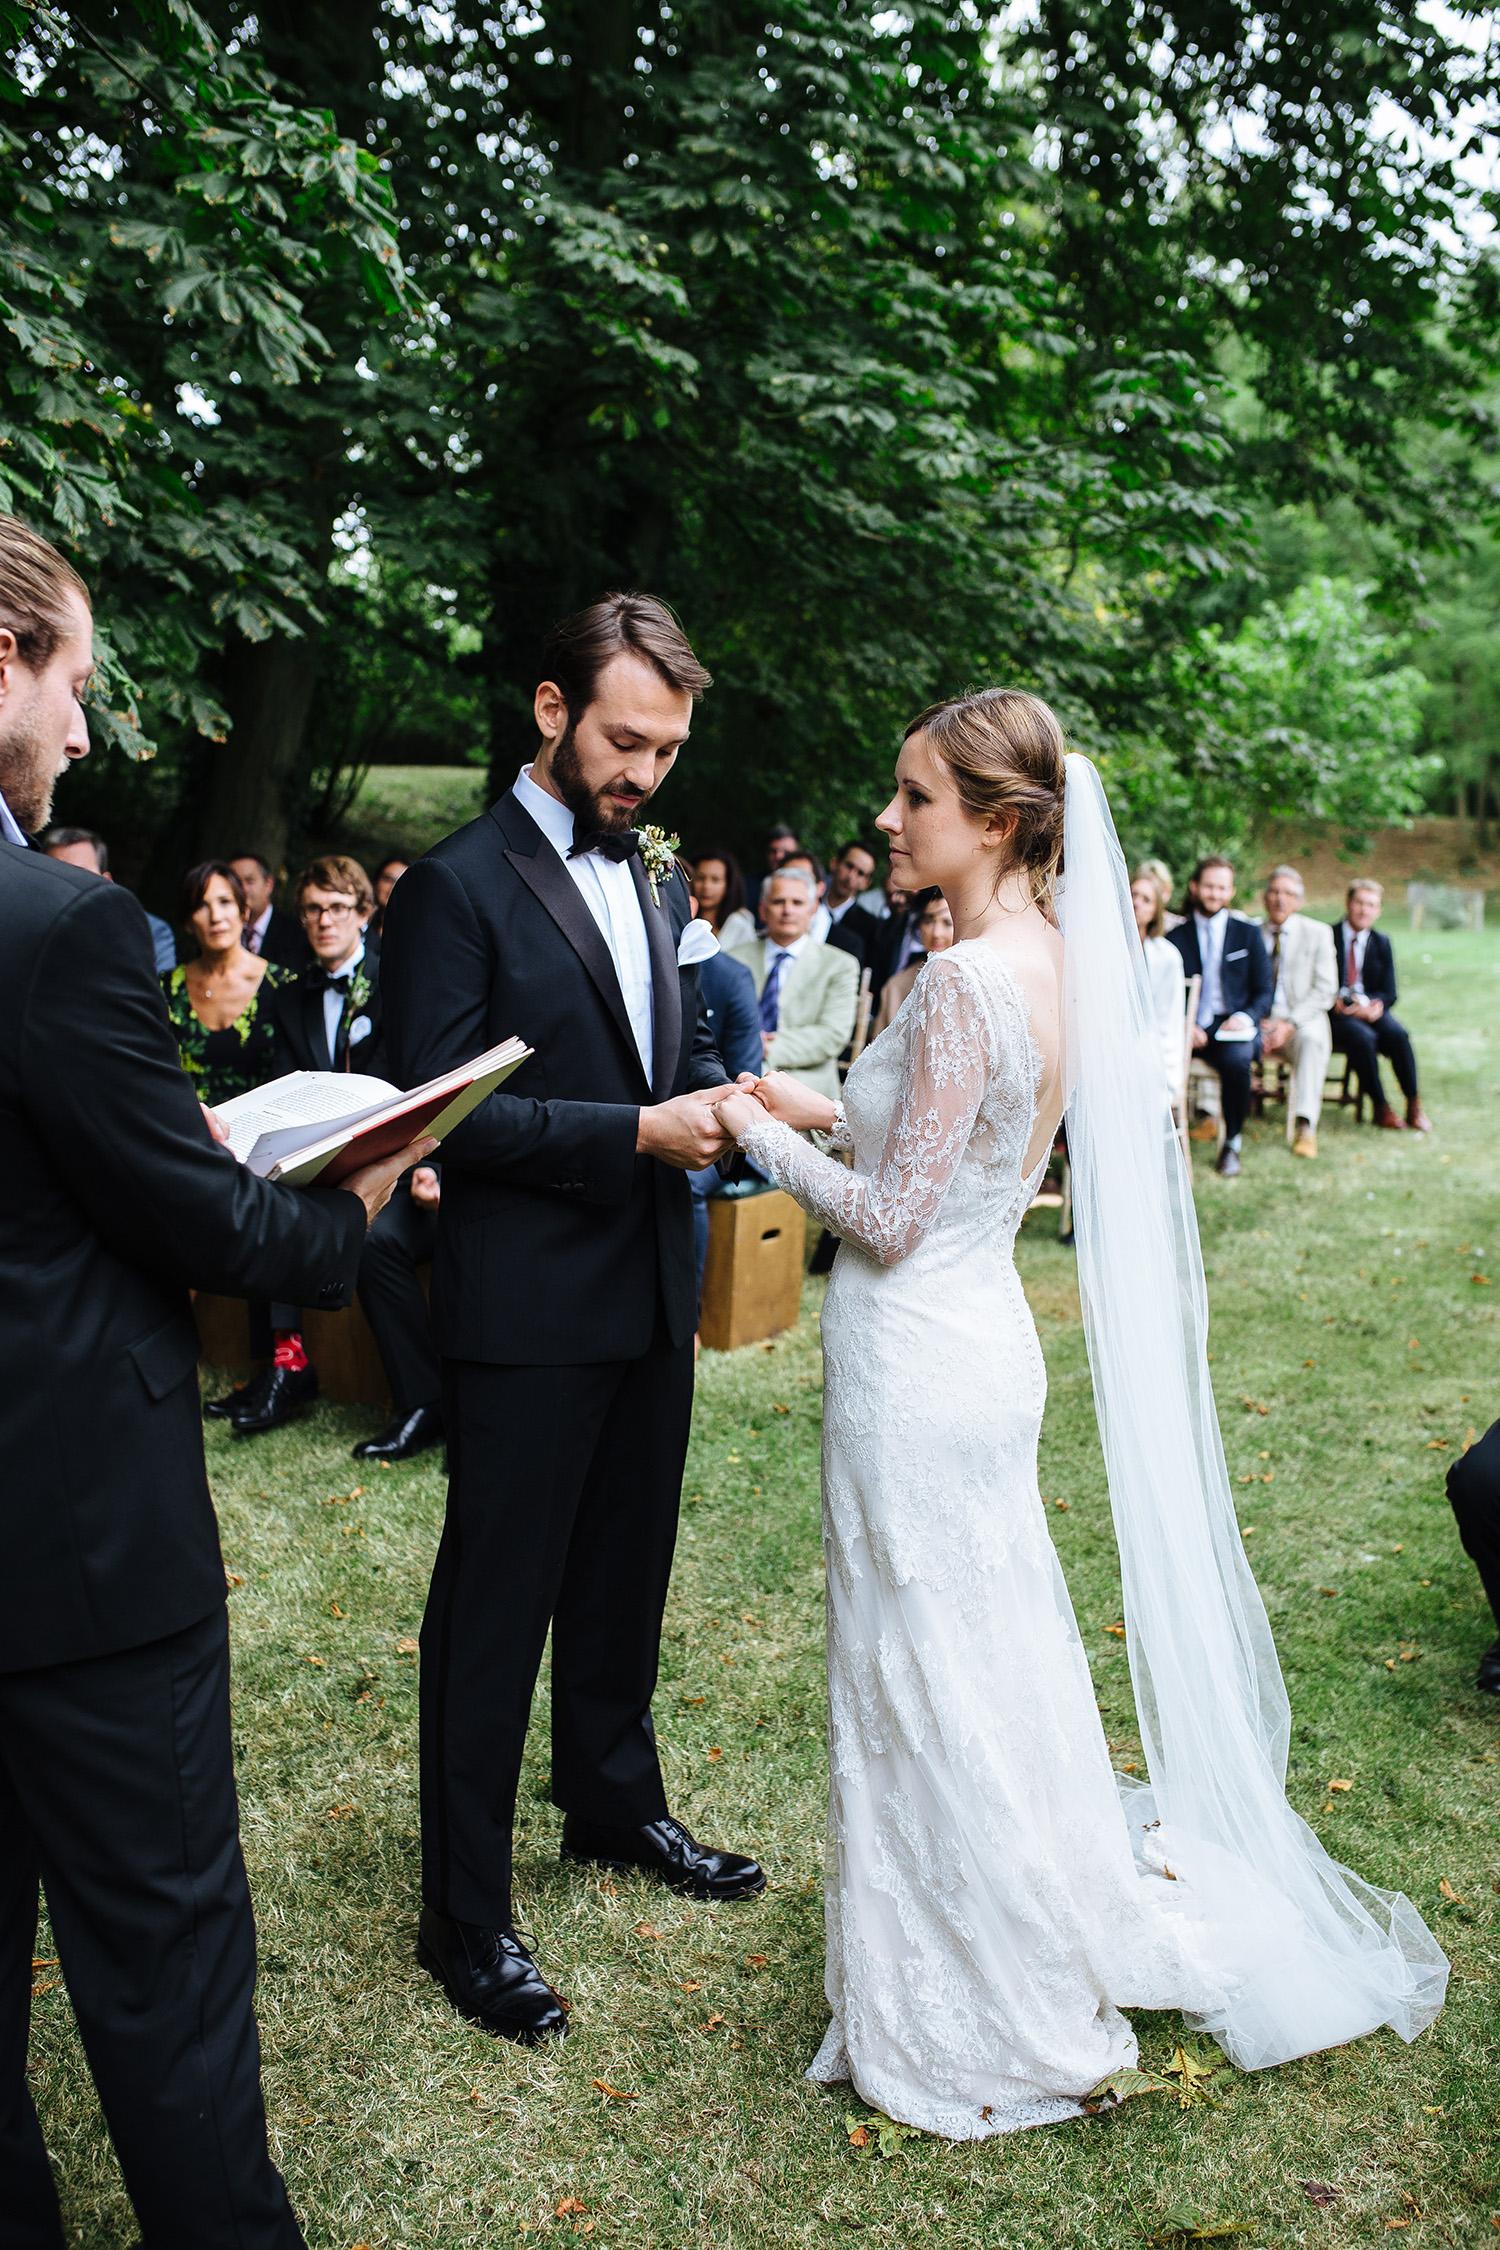 CHILDERLEY HALL CAMBRIDGE WEDDING 44.JPG